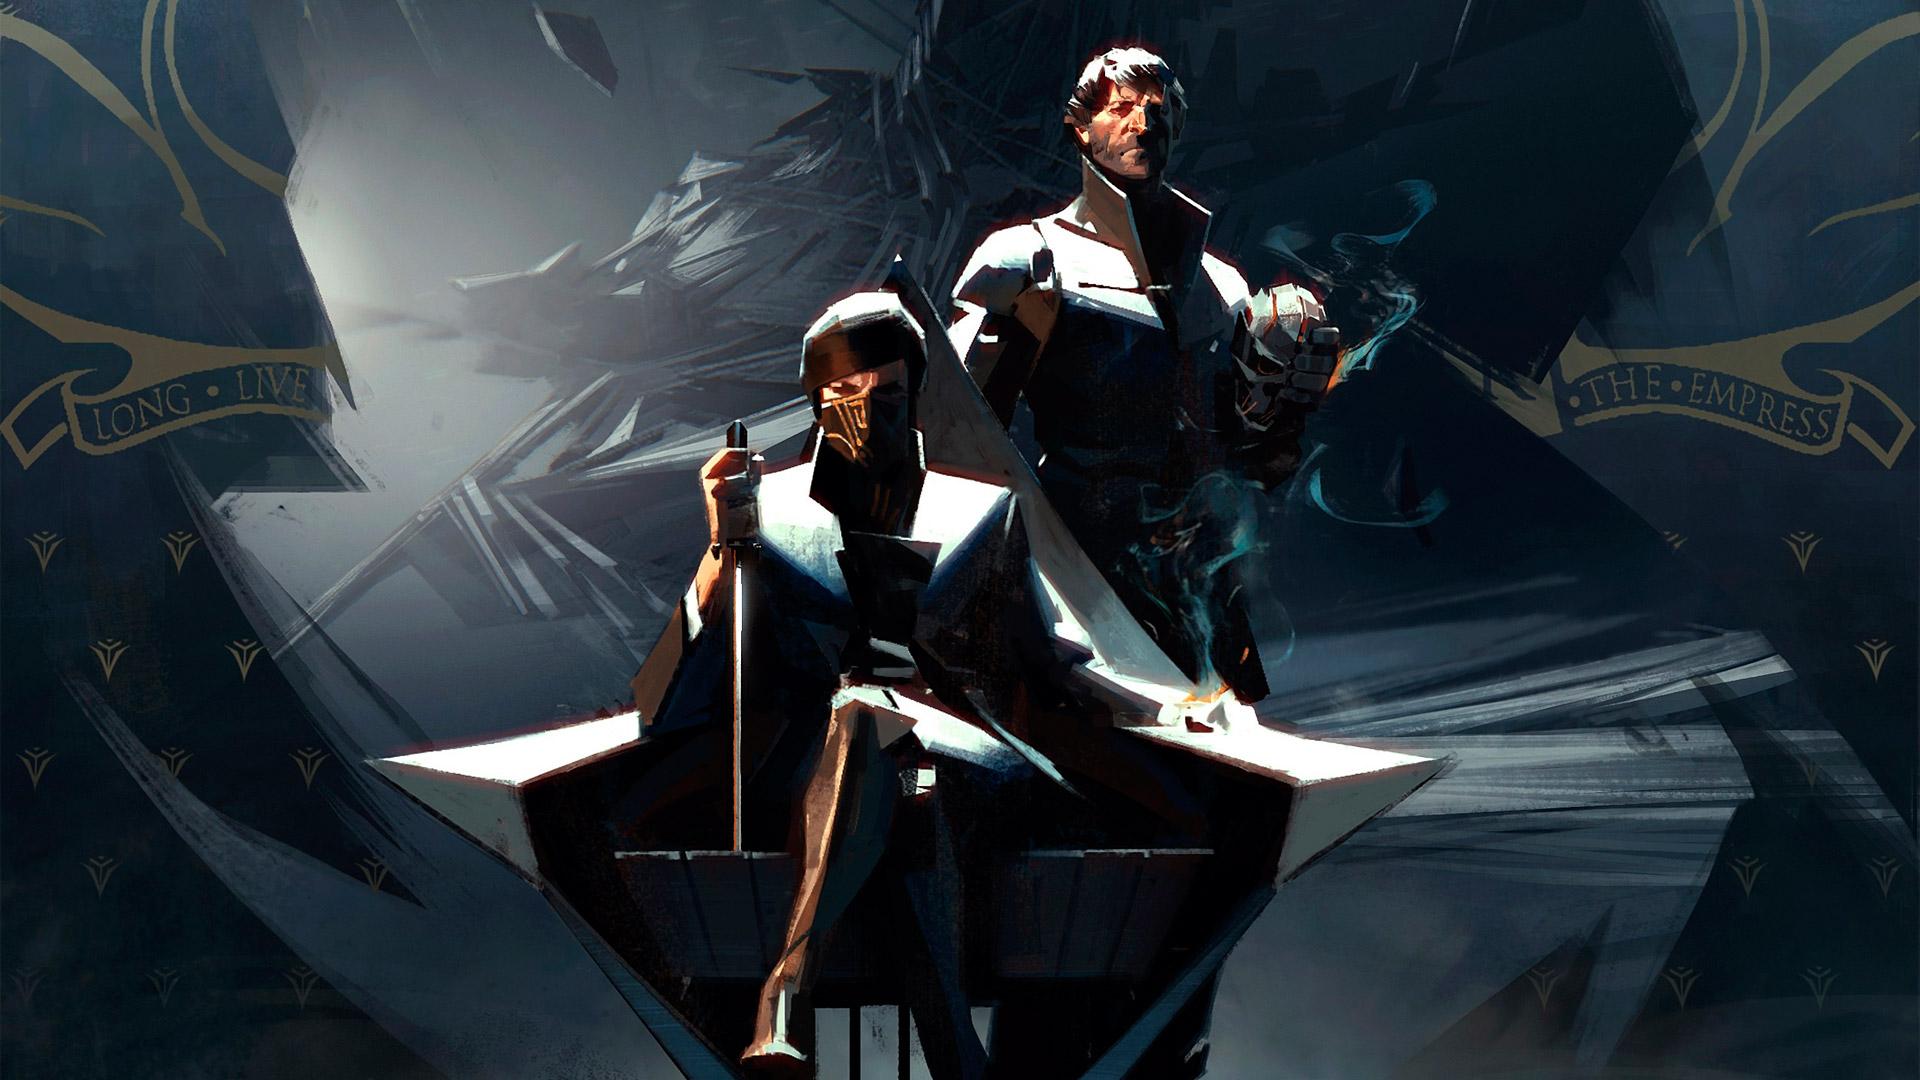 Bethesda prepara concurso de dibujo para Dishonored 2